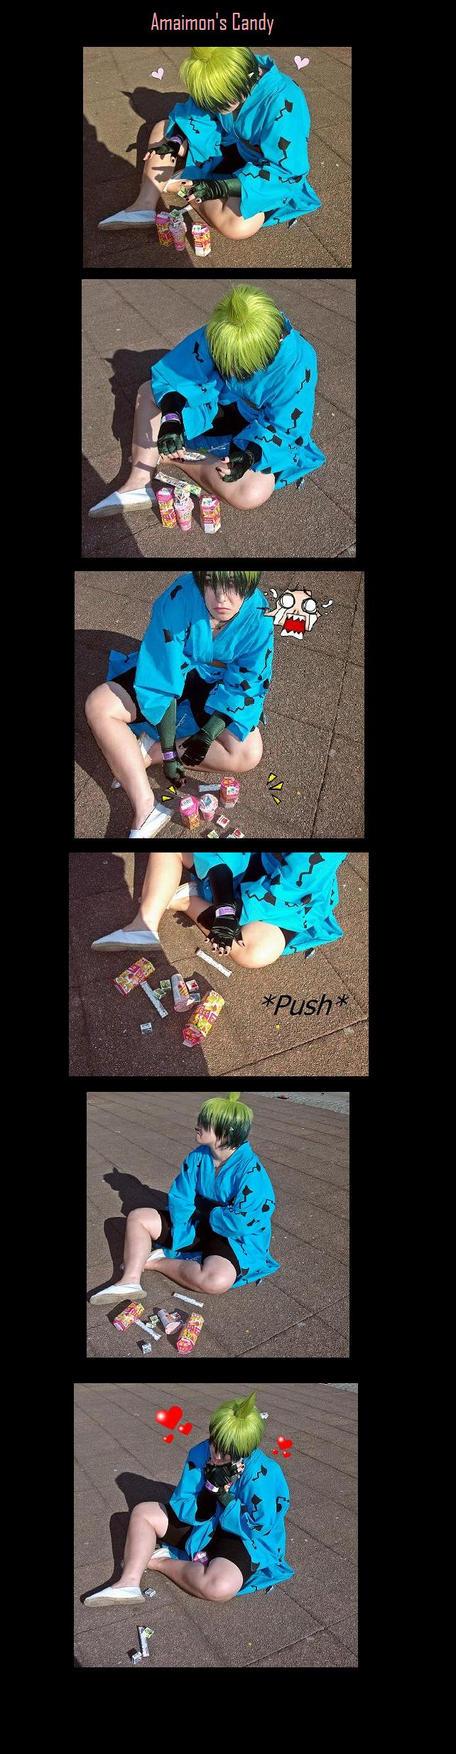 Amaimon's Candy by L-o-l-a-a